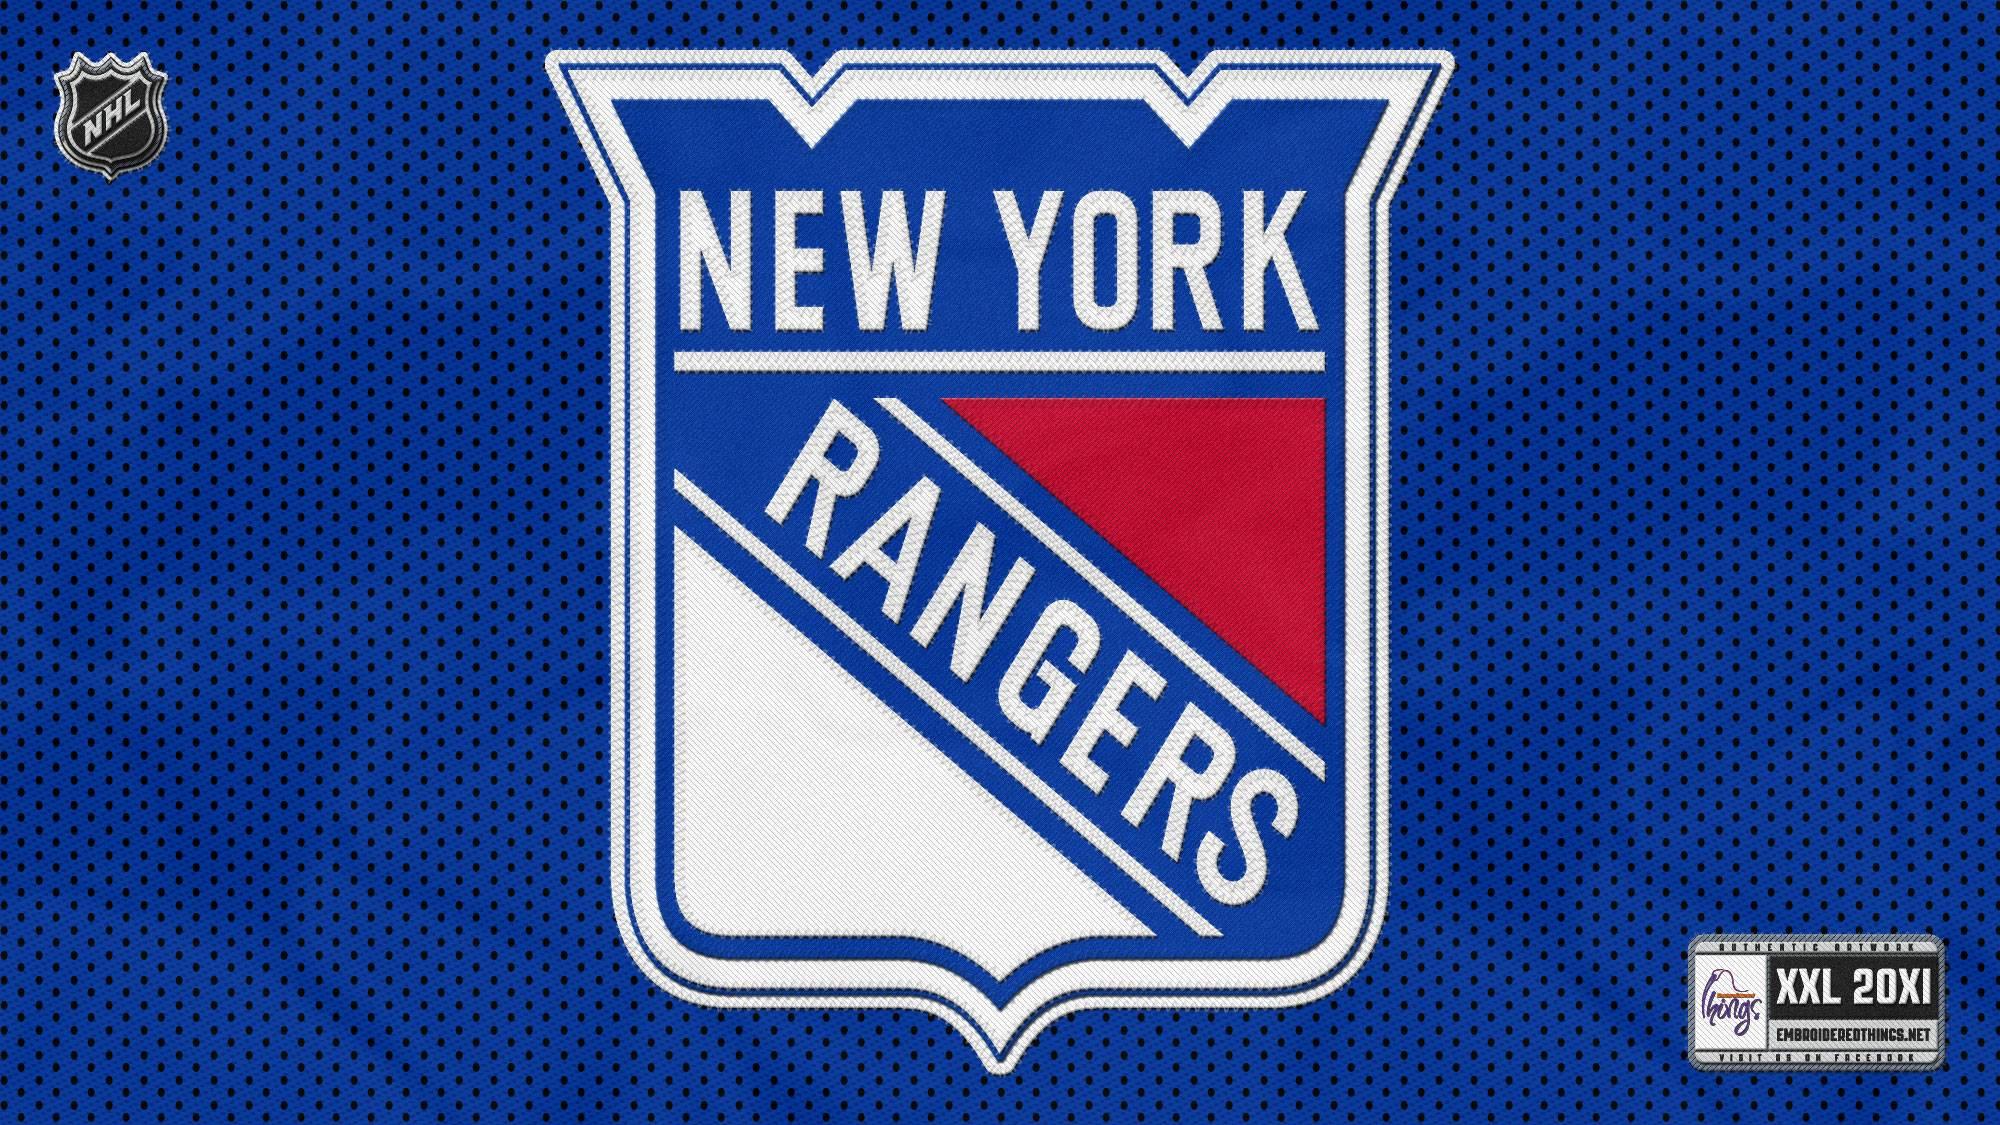 New York Rangers Wallpapers 2000x1125